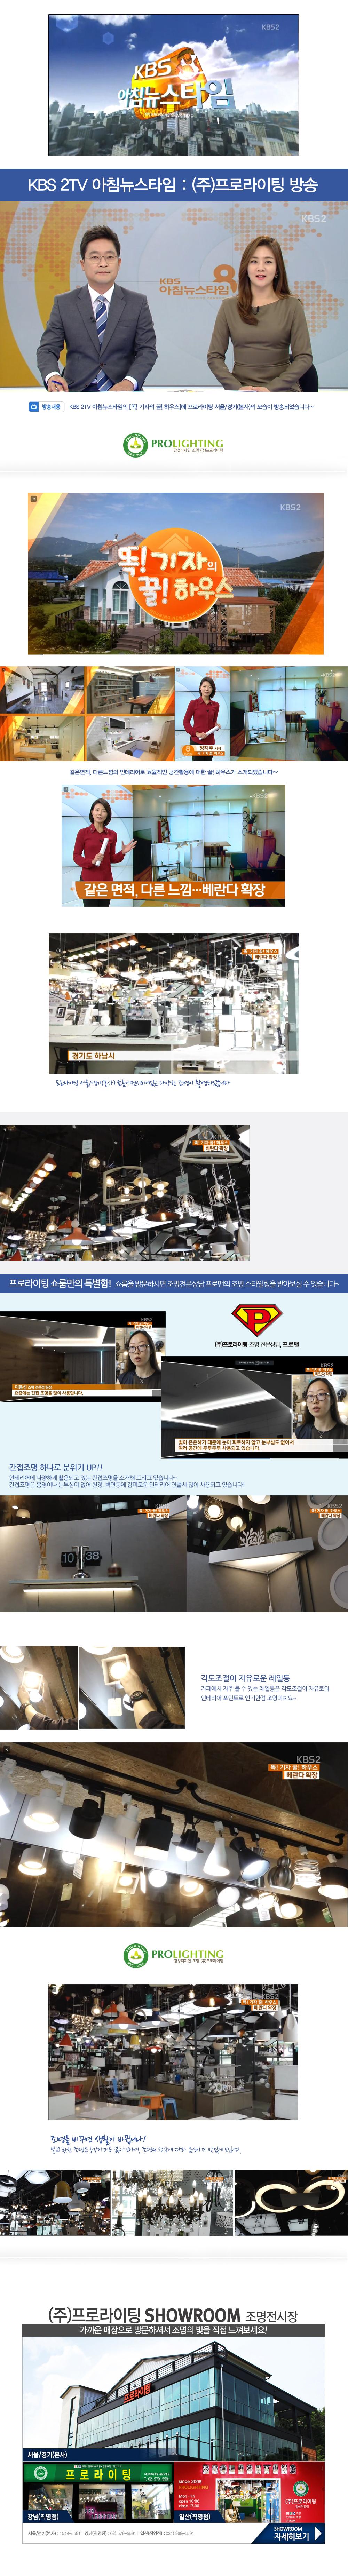 newstime2.jpg